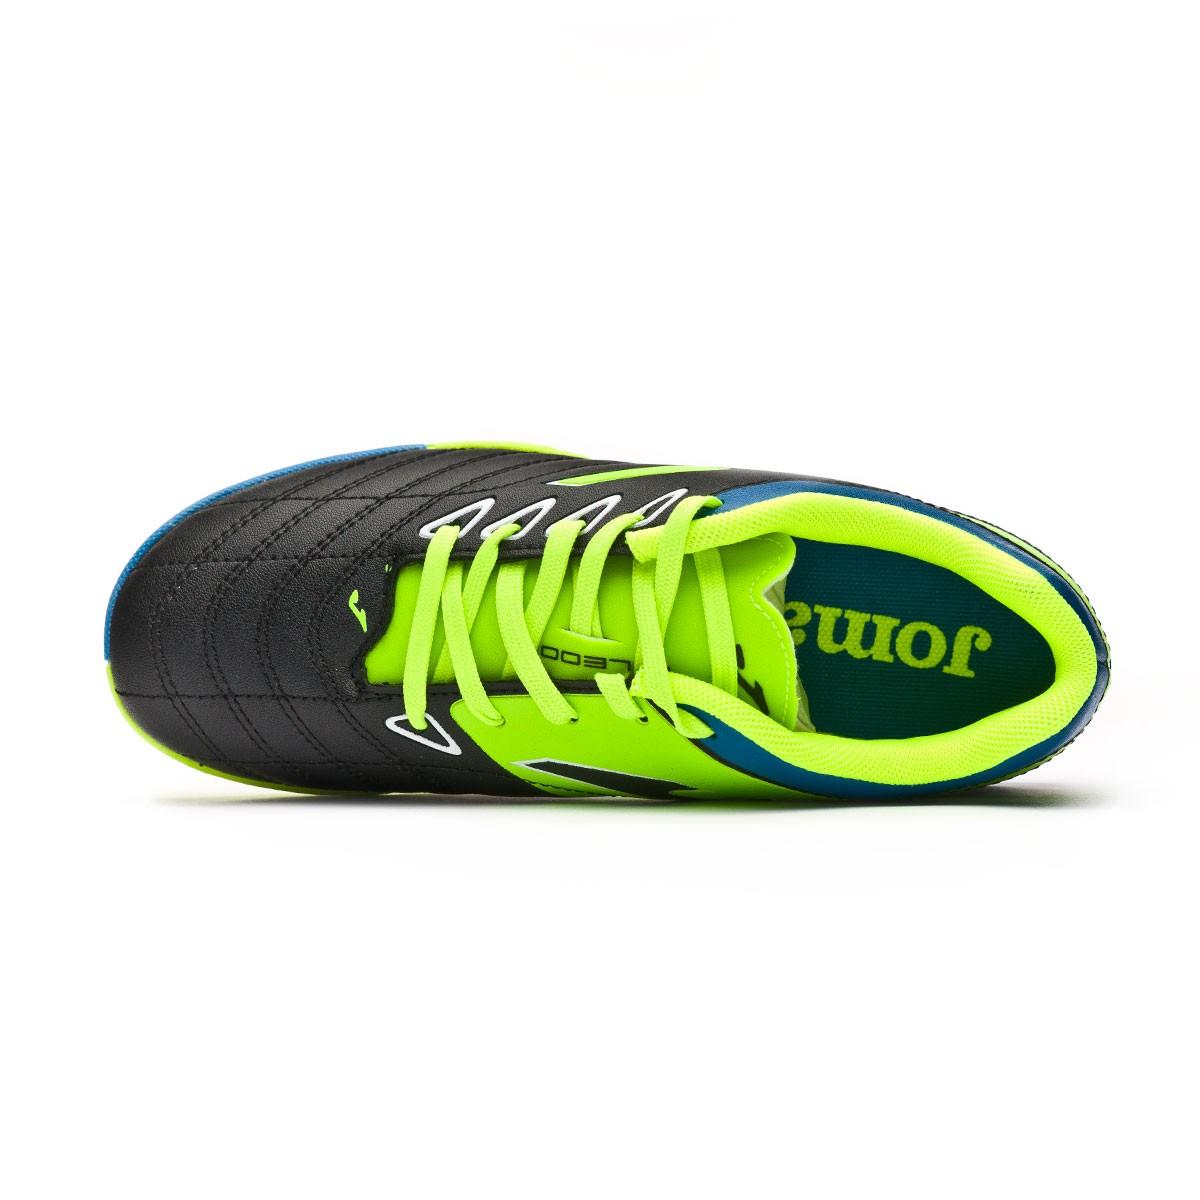 Football Boot Joma Kids Toledo Turf Black-Lime - Leaked soccer d649a651670ae